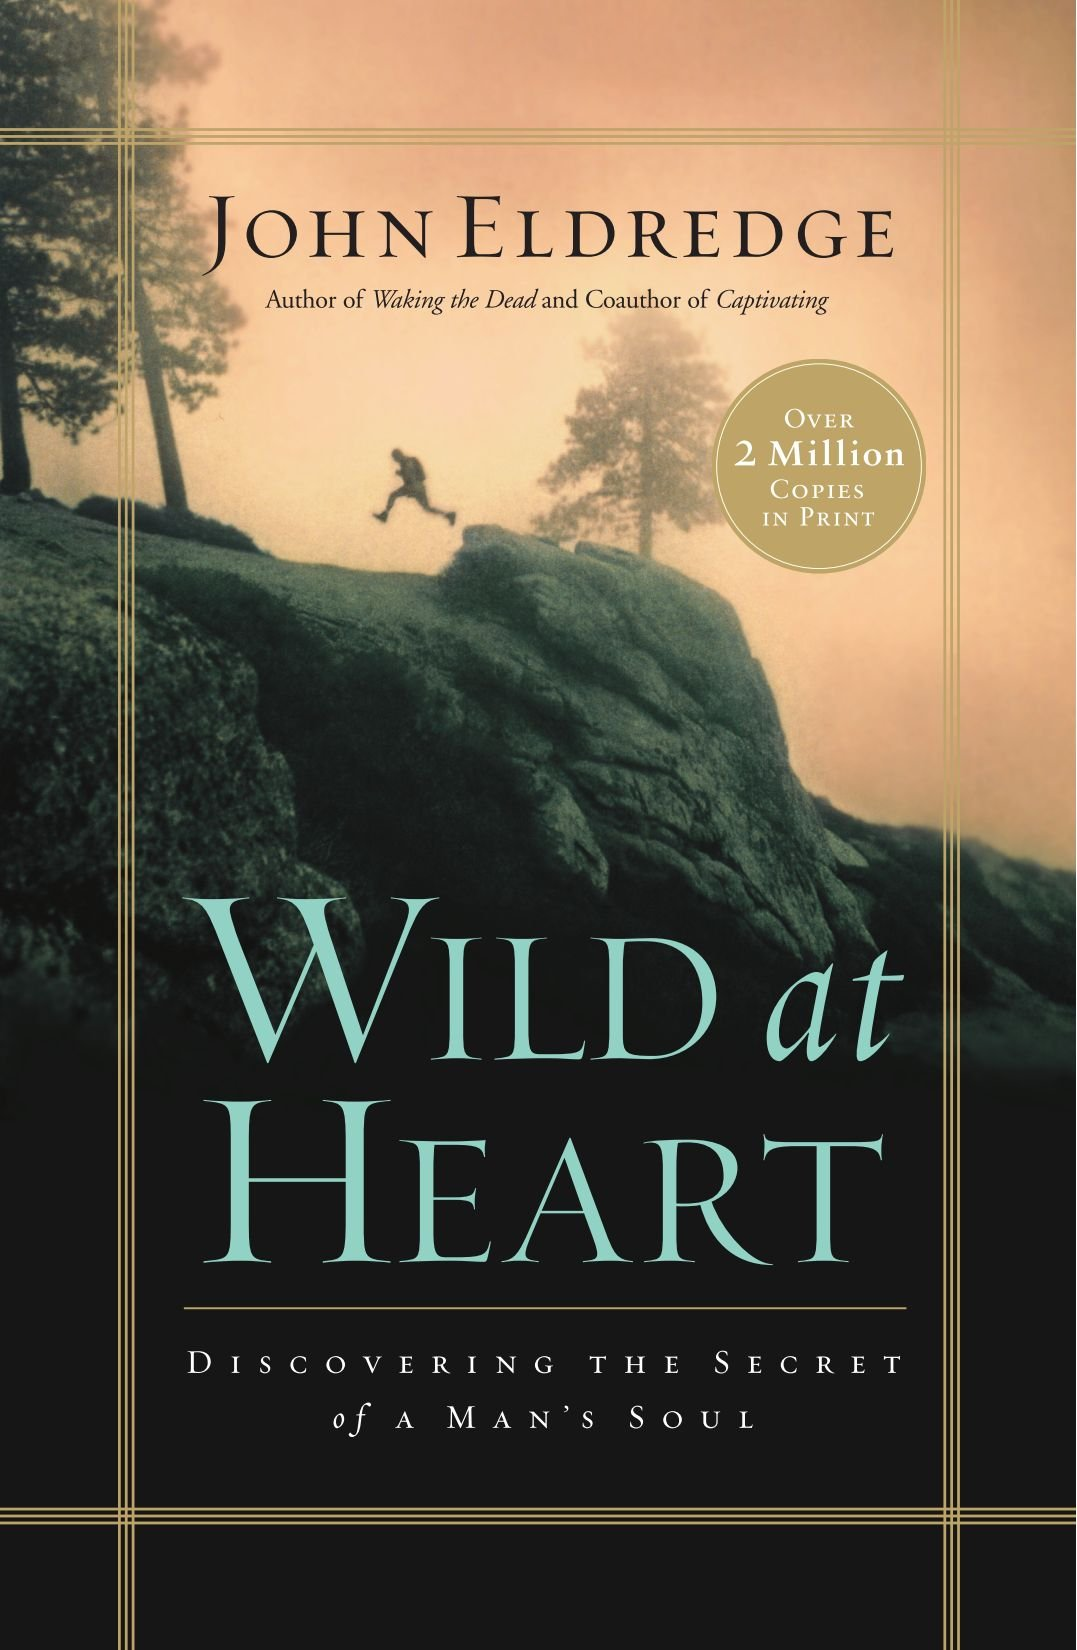 Wild at Heart: Discovering the Secret of a Man's Soul: John Eldredge:  9780785287964: Amazon.com: Books